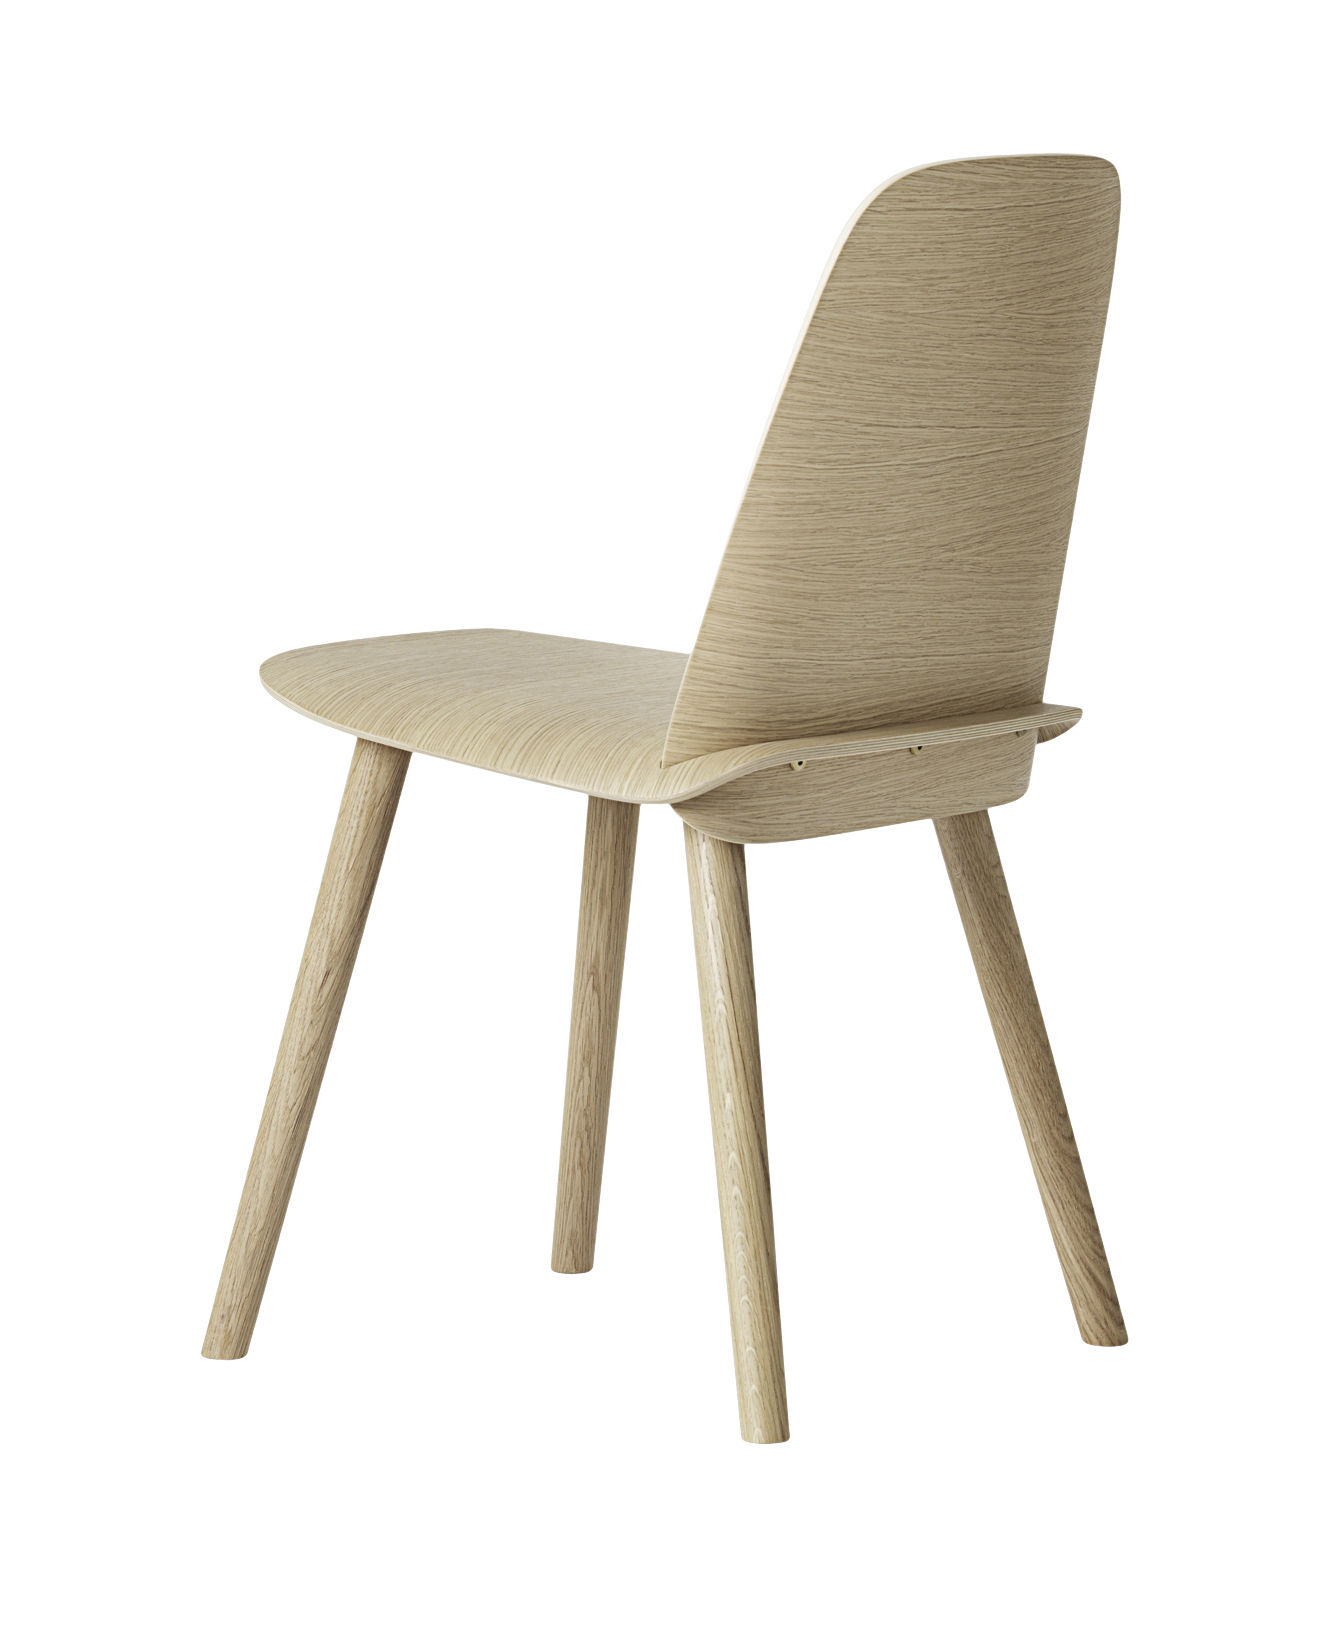 chaise nerd bois blanc muuto made in design. Black Bedroom Furniture Sets. Home Design Ideas